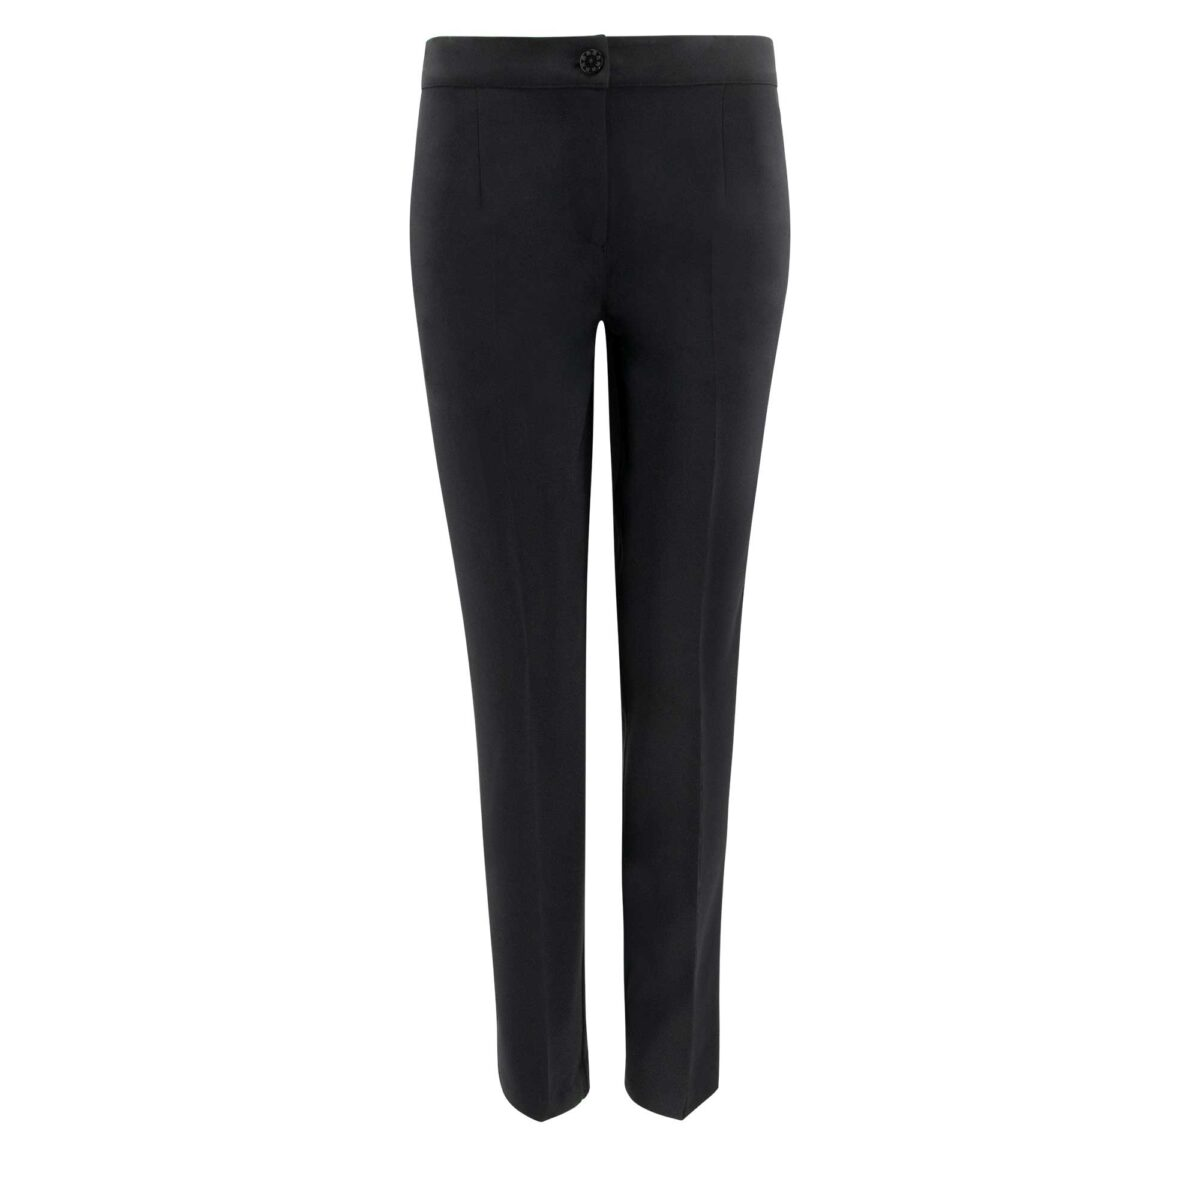 Pantalone Straight Nero - vista frontale   Nicla